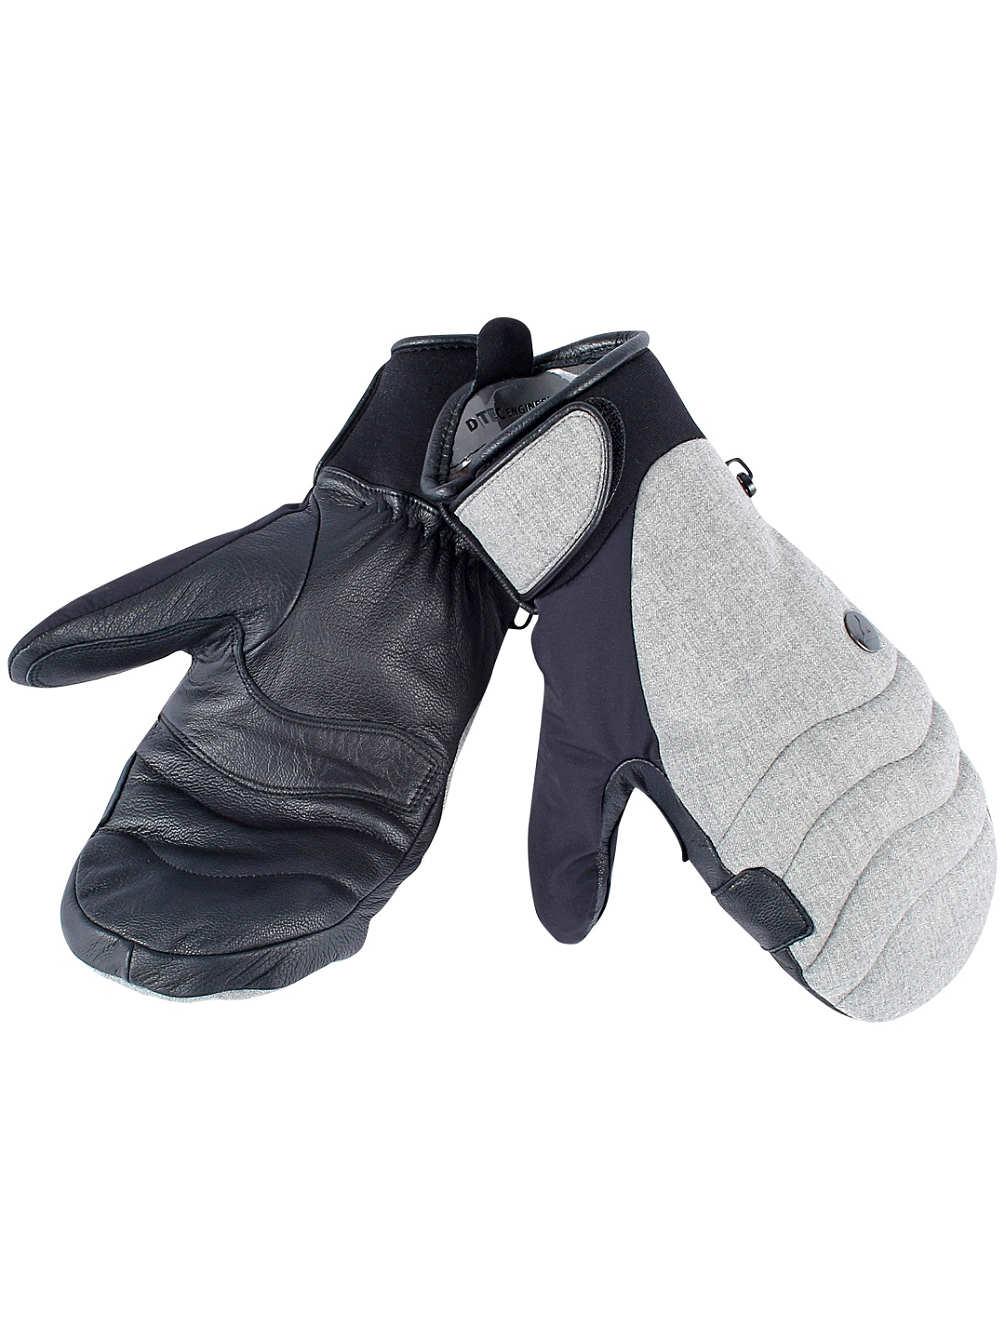 moufles ski gore tex fell mitt dainese tous les gants. Black Bedroom Furniture Sets. Home Design Ideas